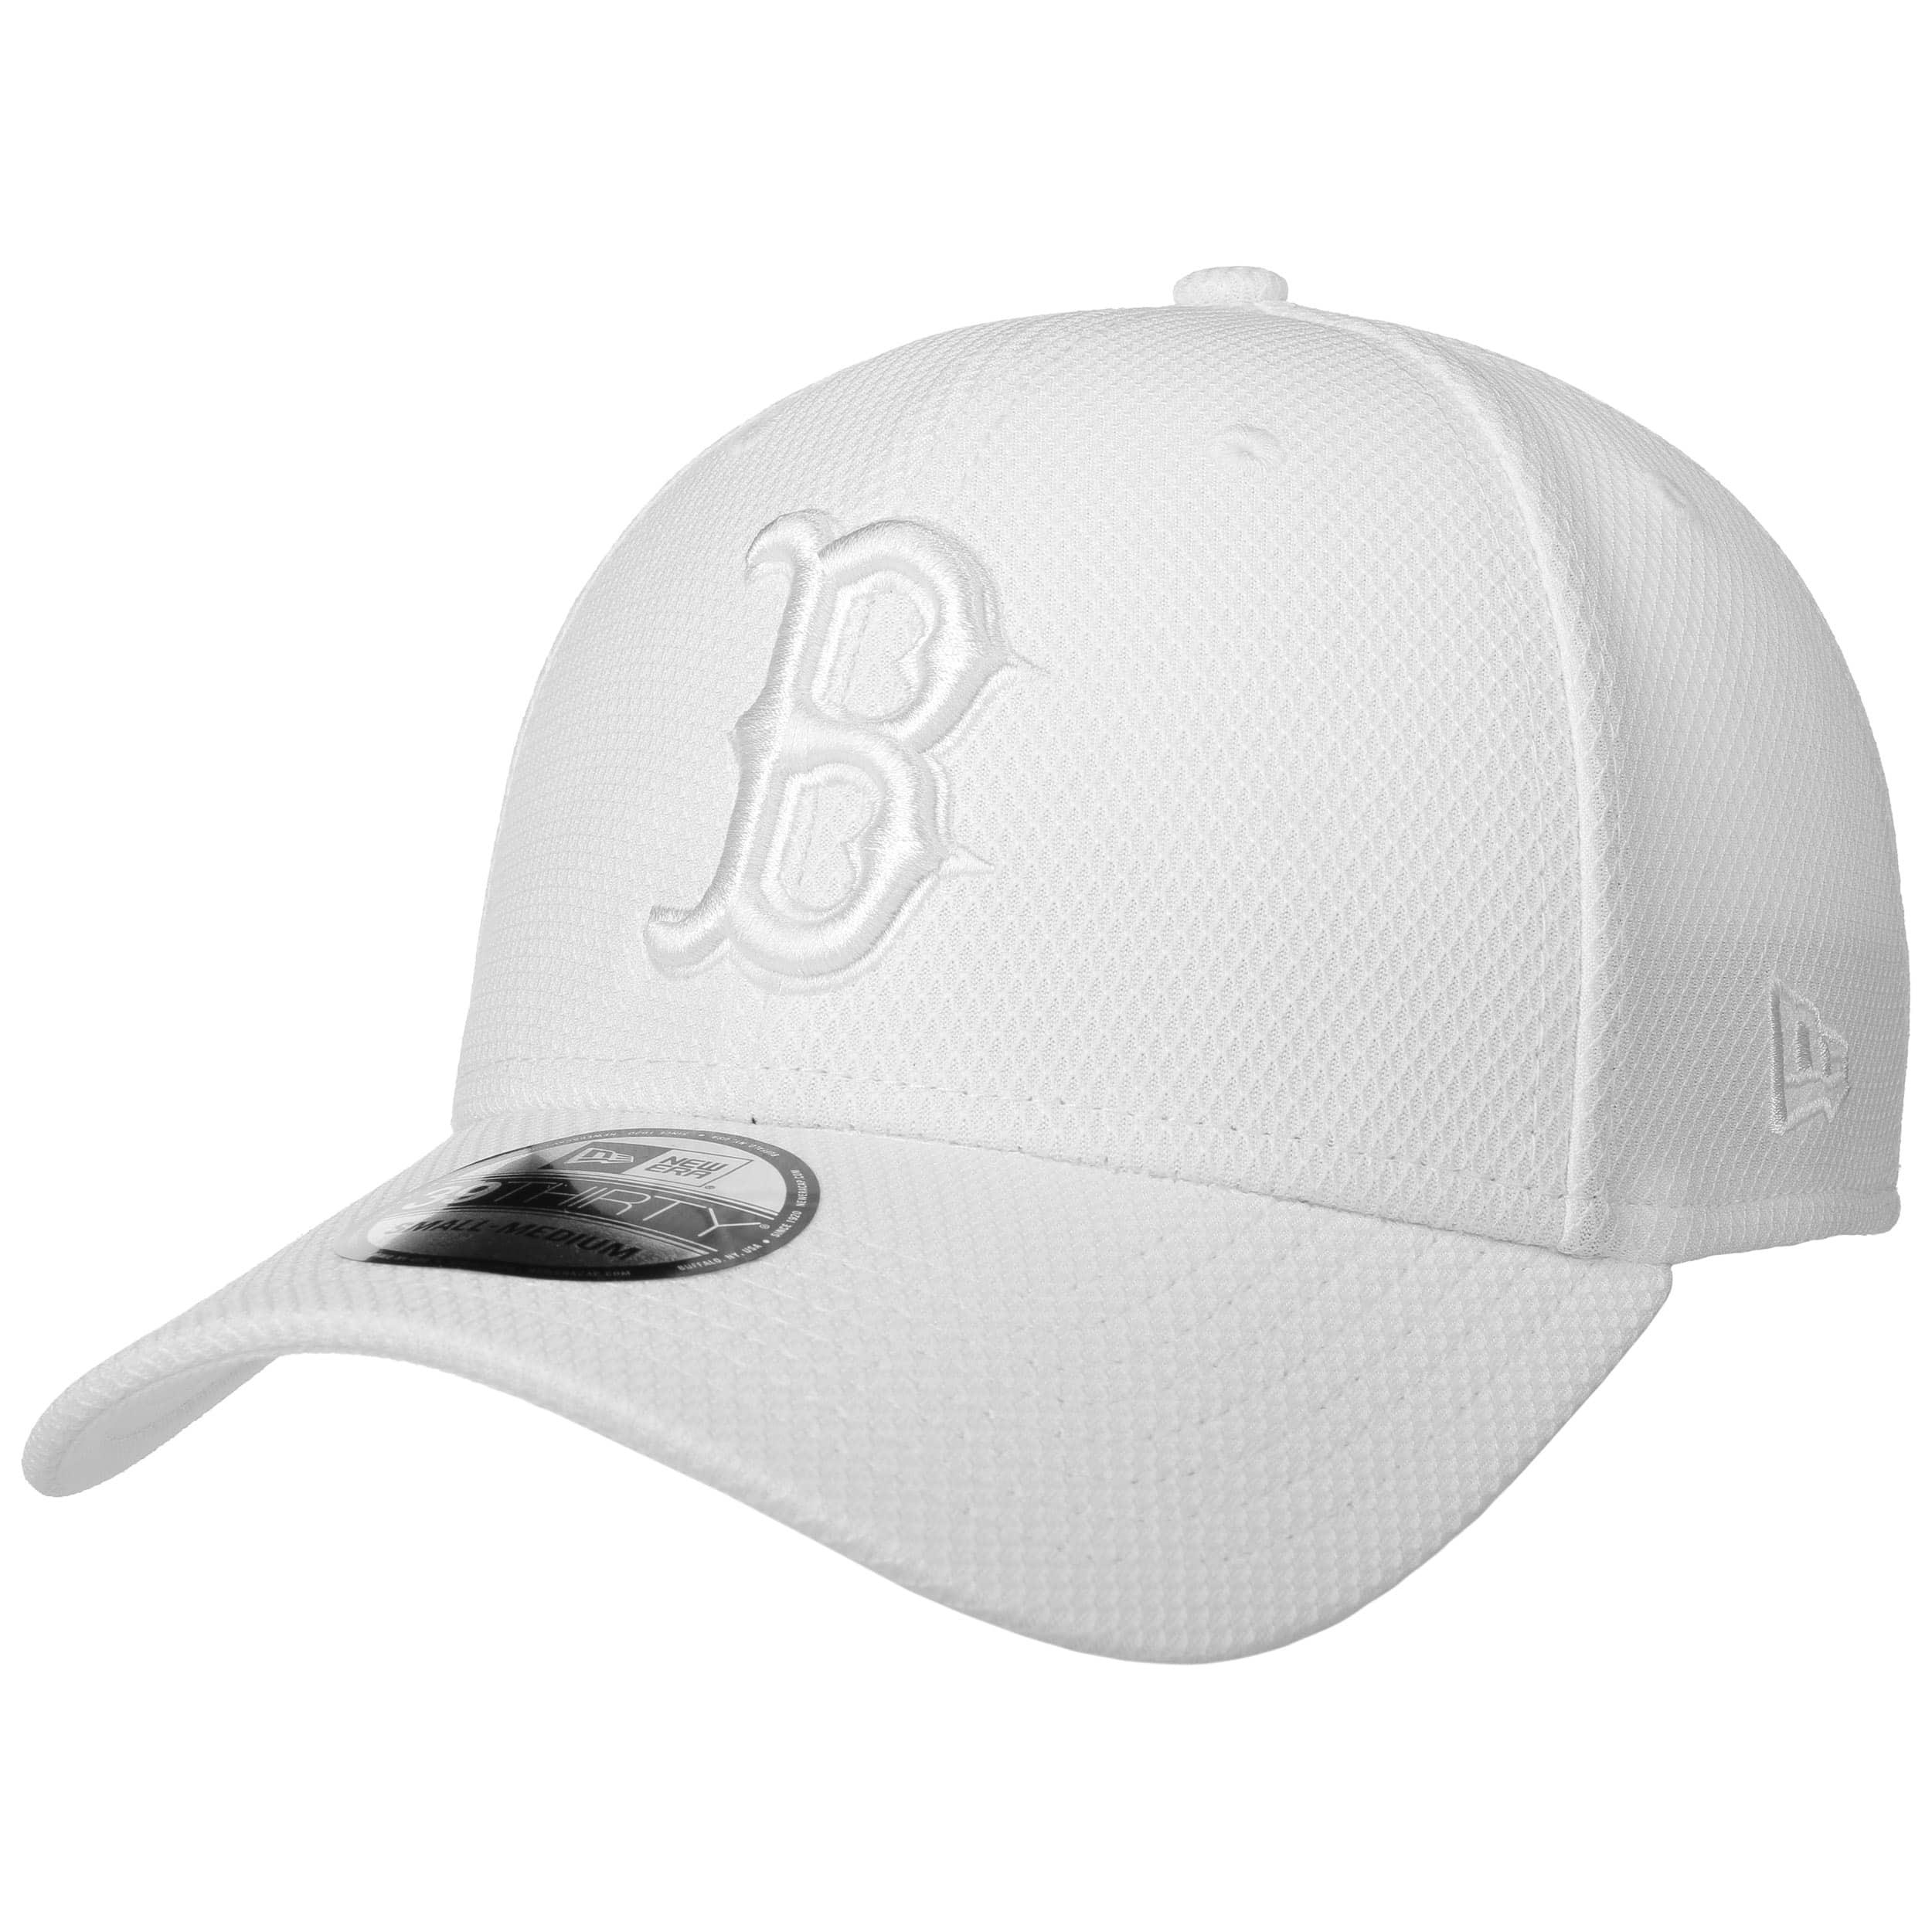 39Thirty Diamond Red Sox Mono Cap by New Era - white 1 01b616d5c1b